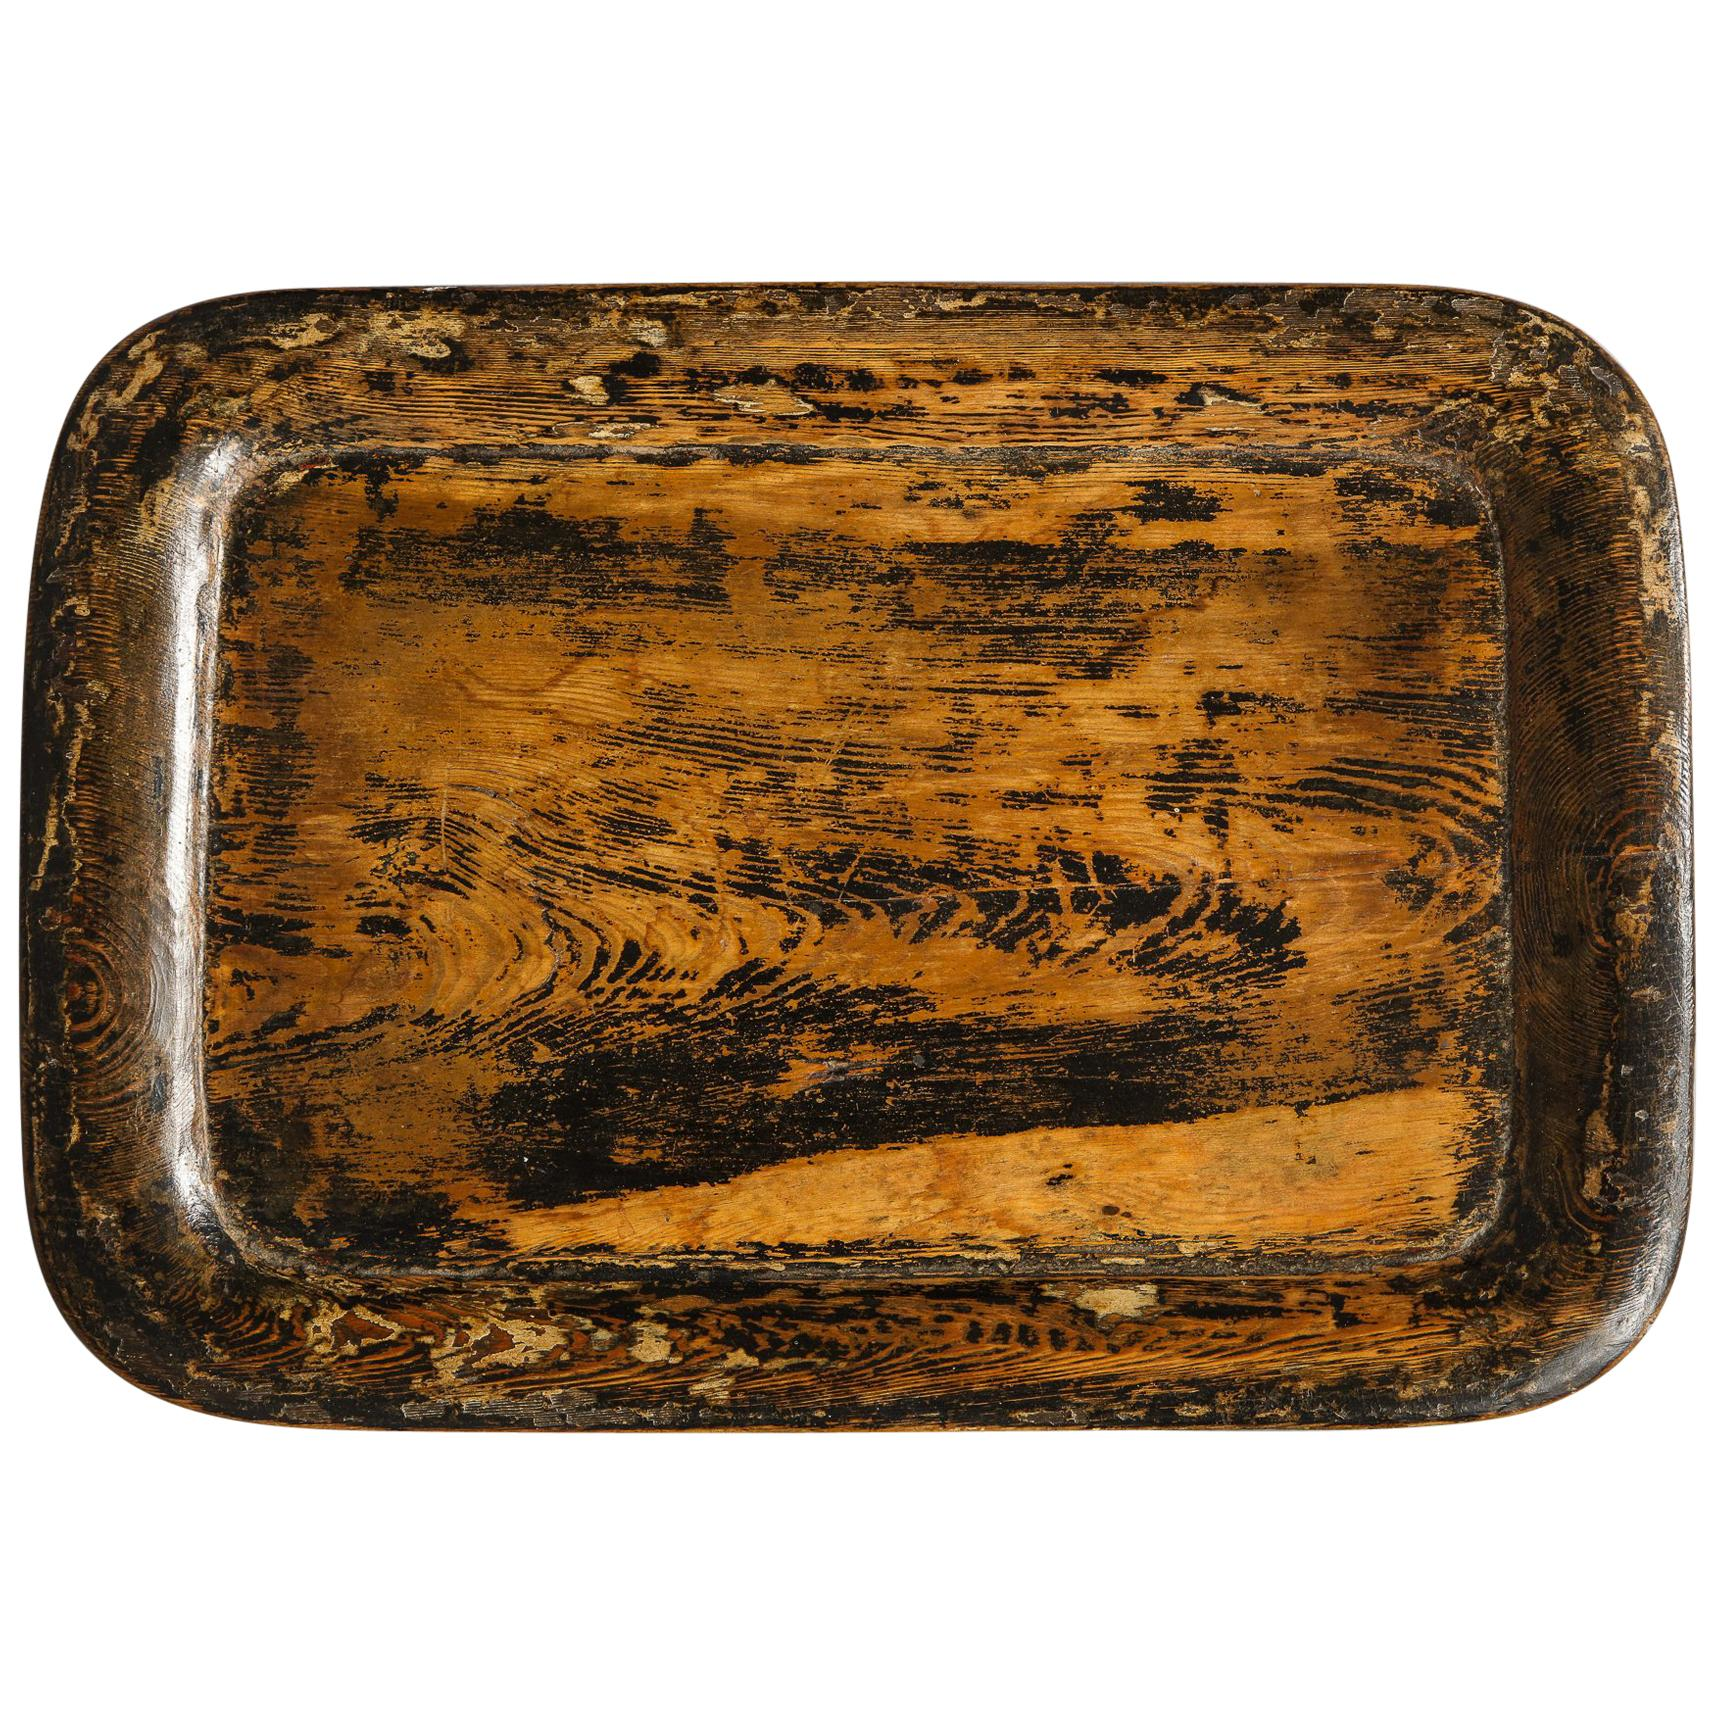 19th Century English Dish Carved Tray